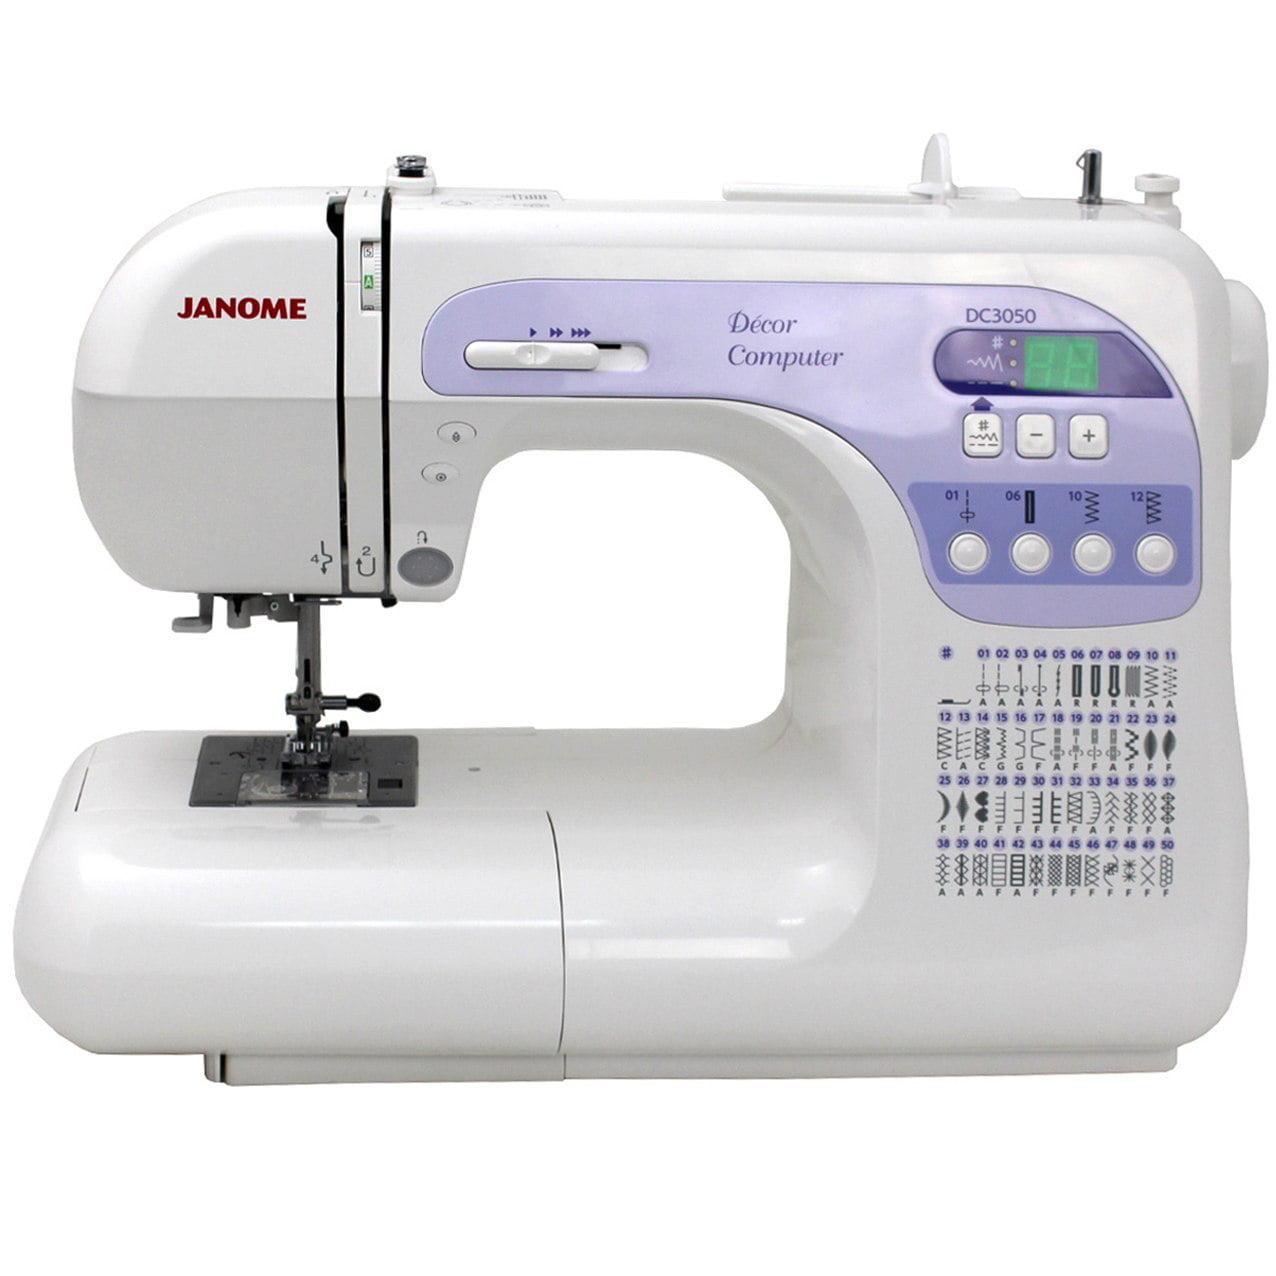 Janome DC 3050 Computerized Sewing Machine with Exclusive Bonus Bundle